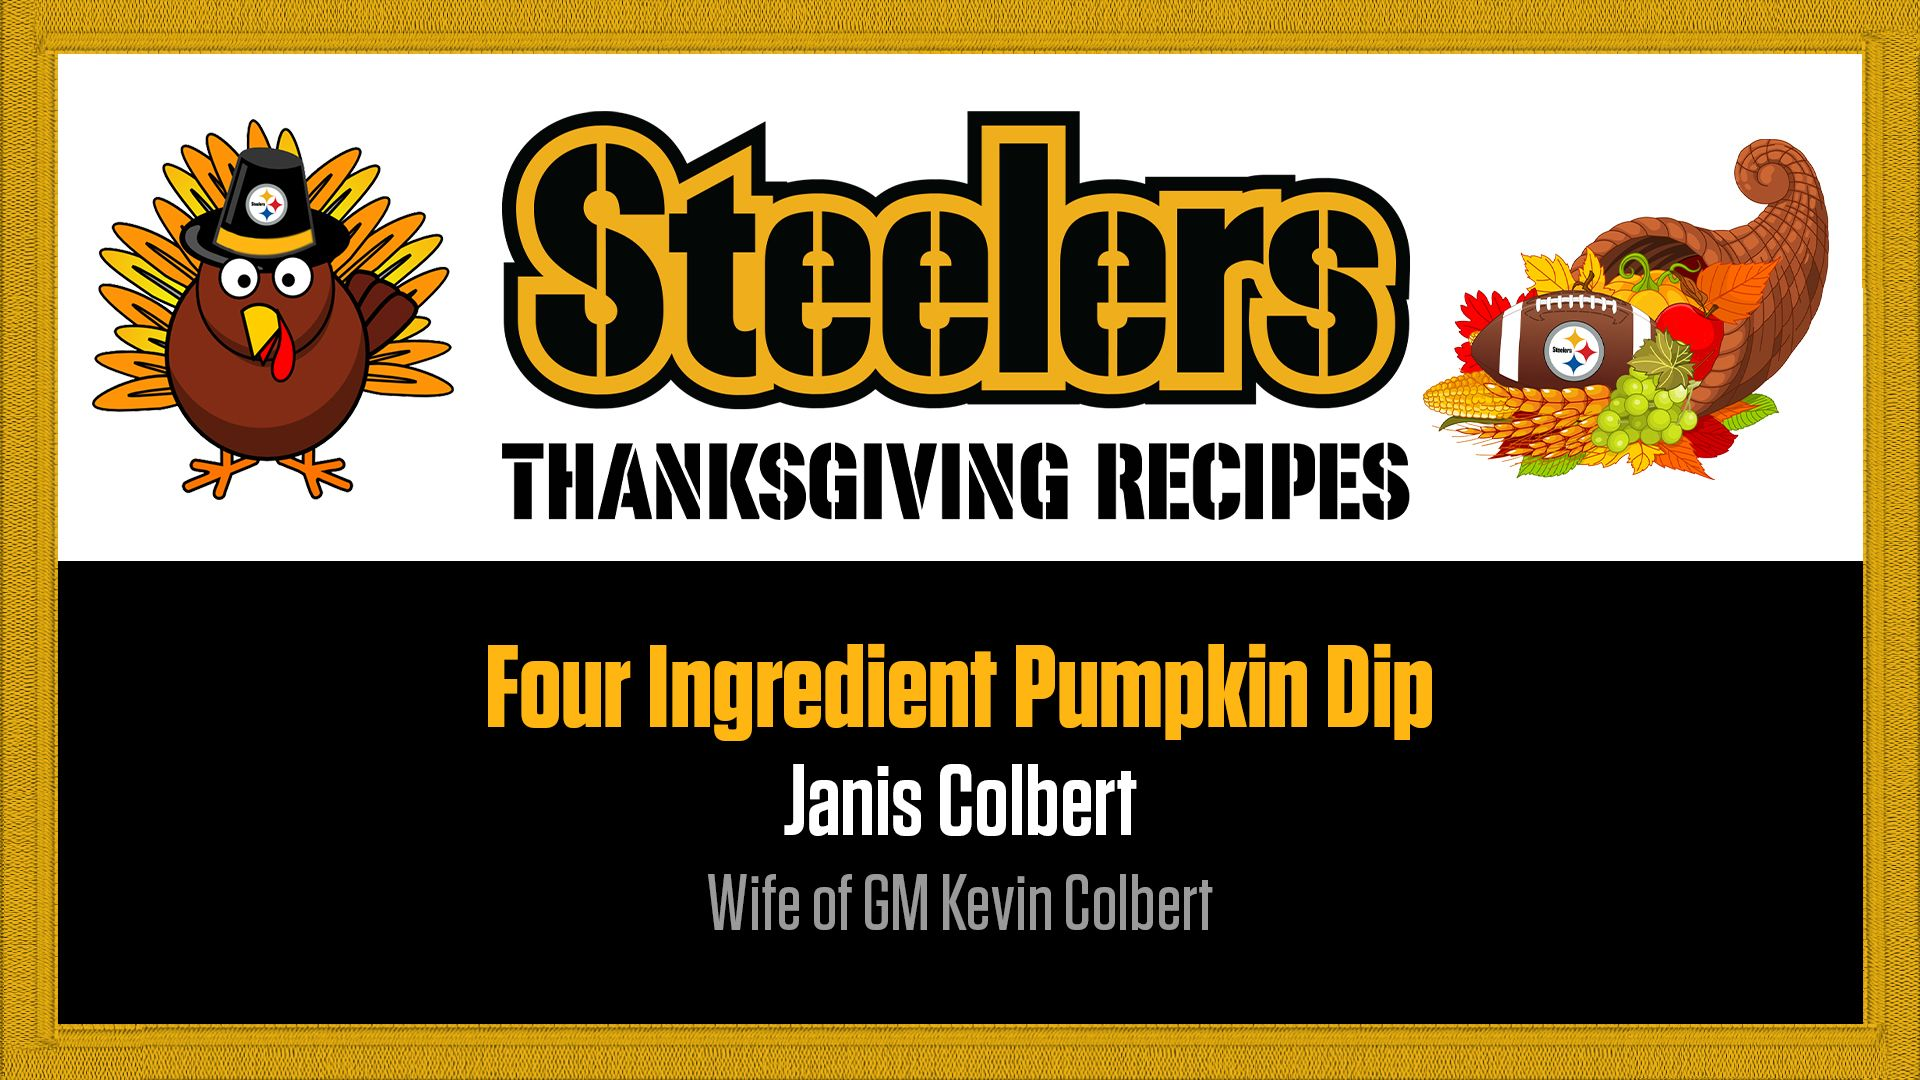 Recipe - four ingredient pumpkin dip_janis colbert